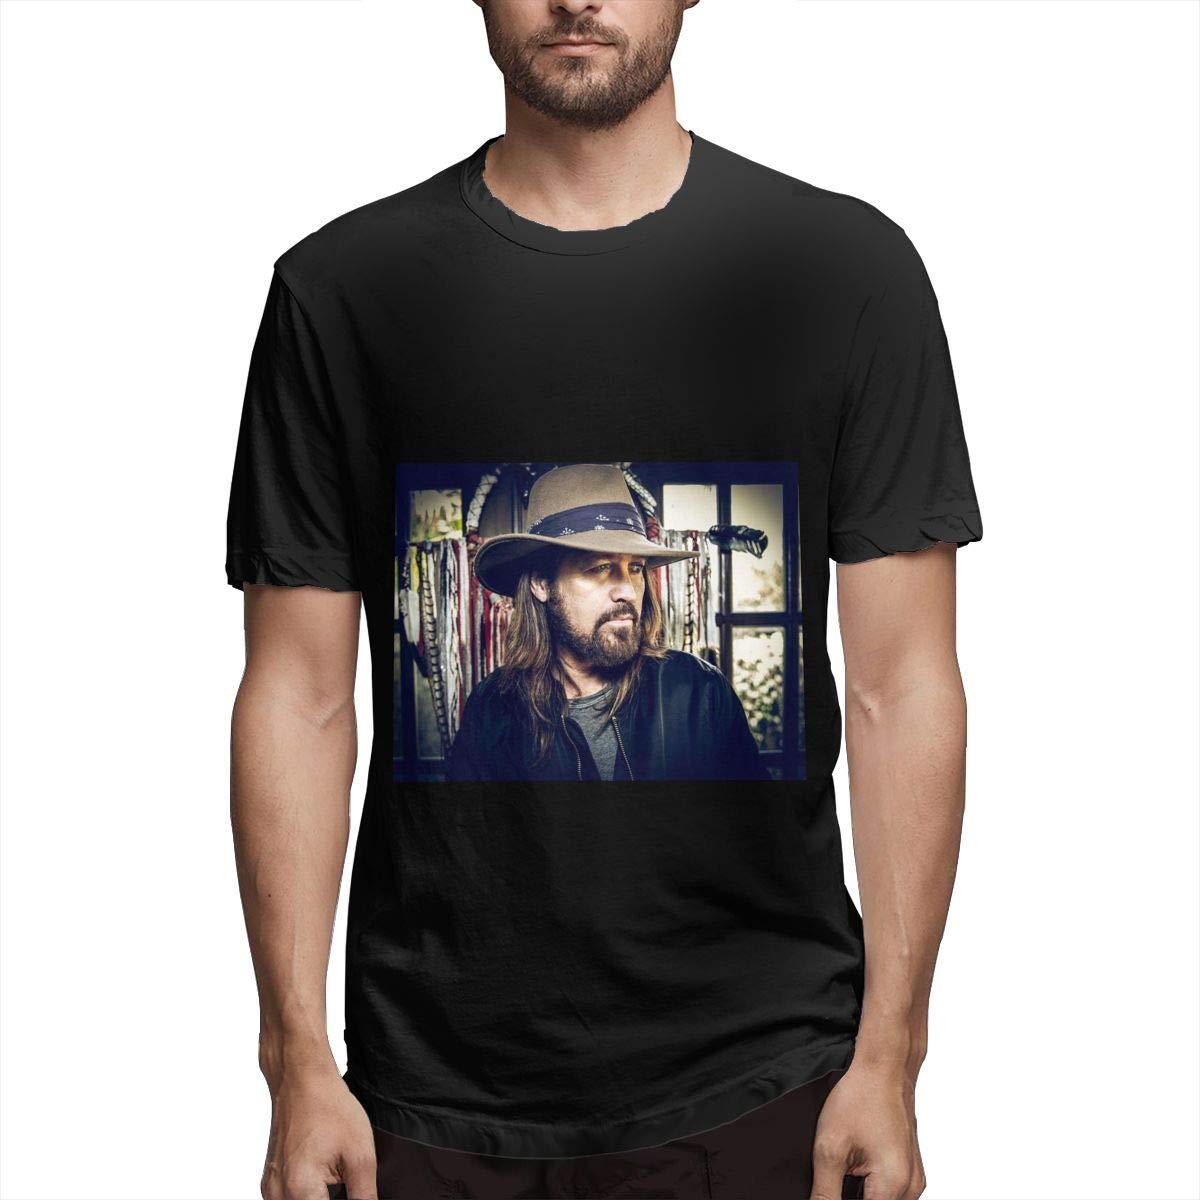 Lihehen Mans Billy Ray Cyrus Retro Printing Round Neck Tees Shirts